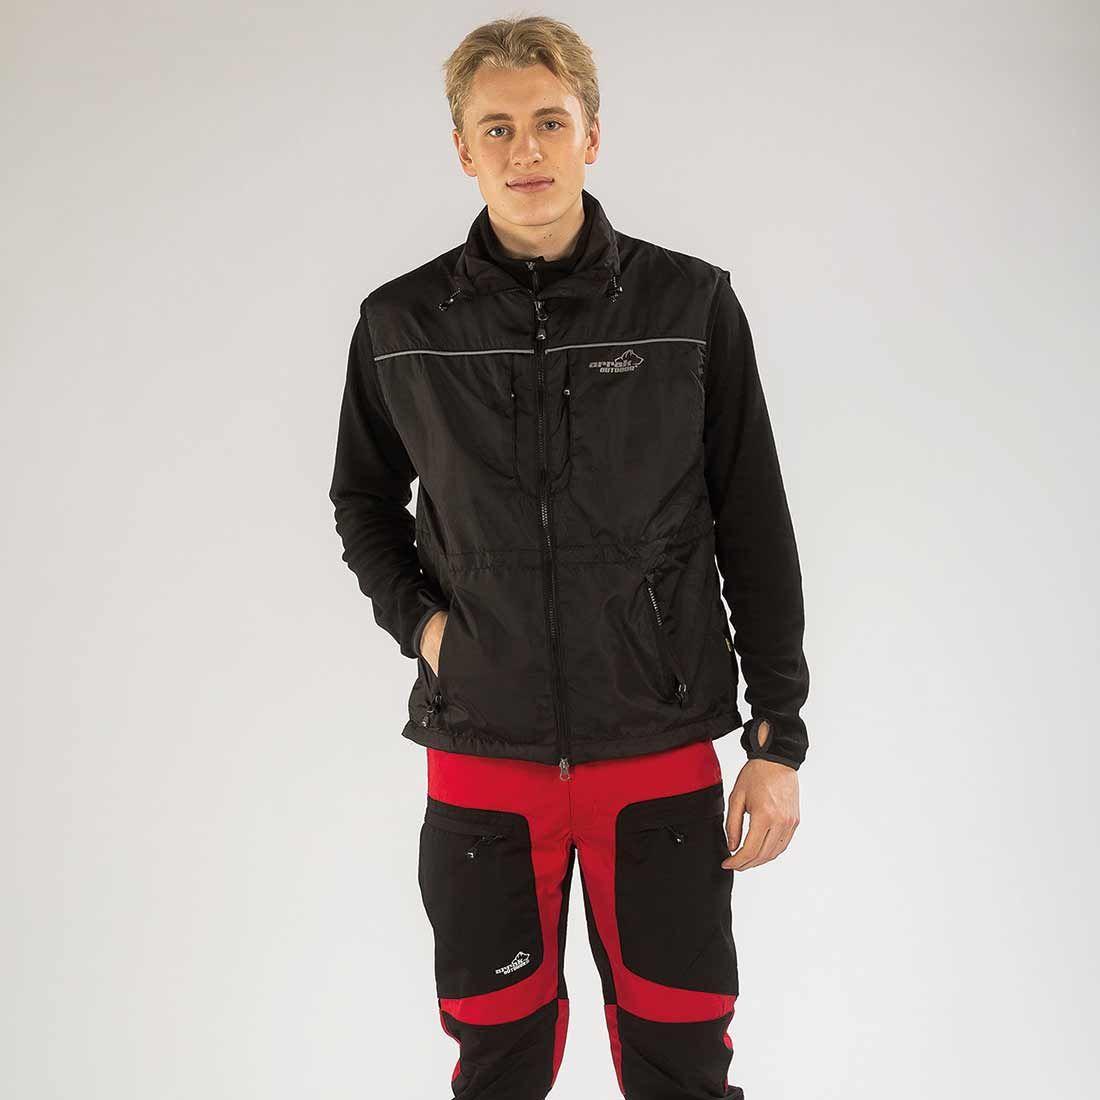 Arrak Jumper vest Black XS